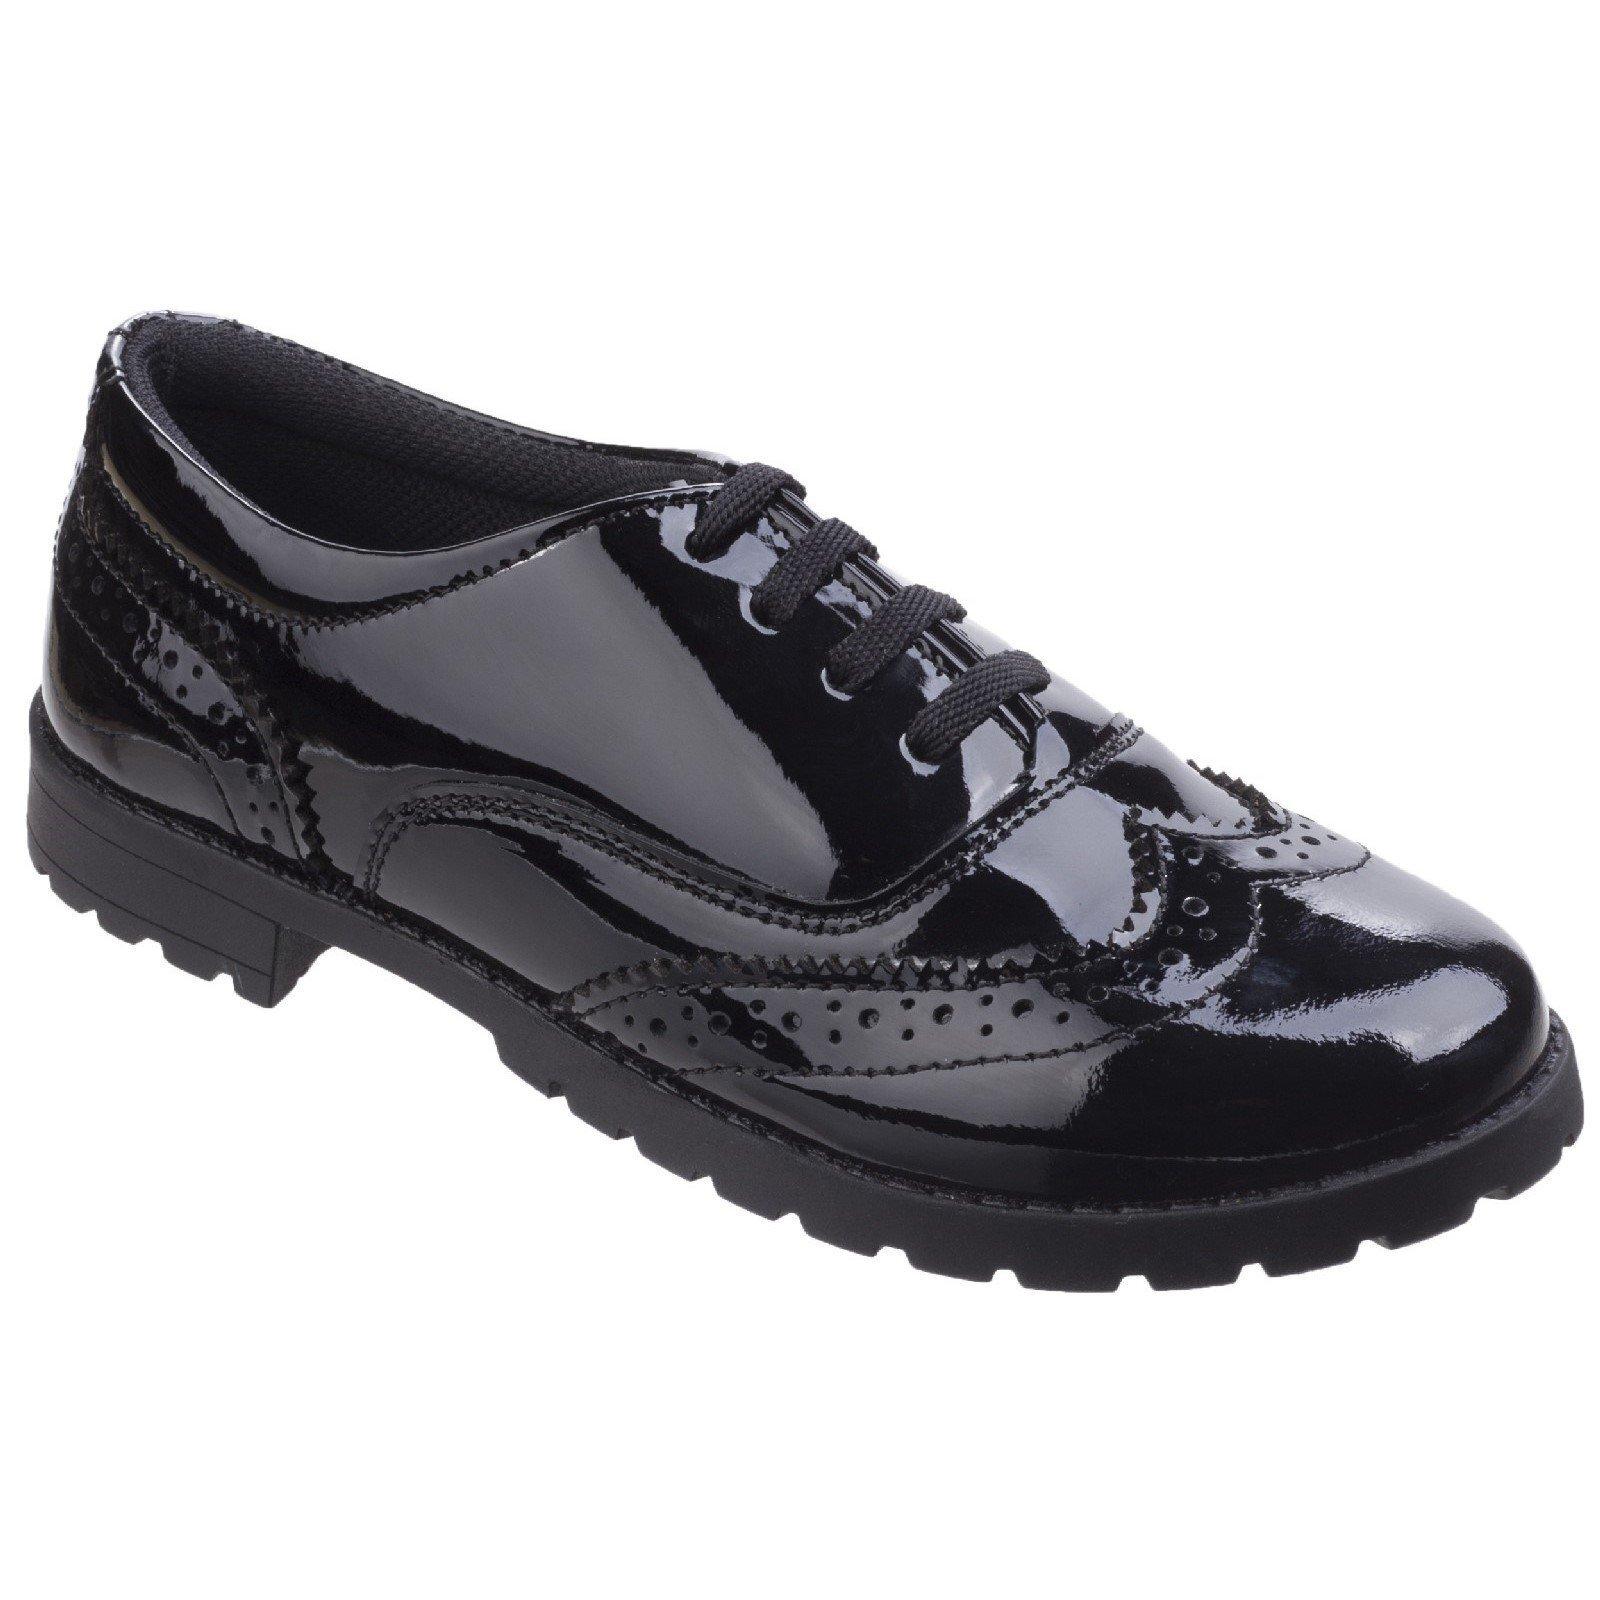 Hush Puppies Girls Eadie Patent Leather School Shoes (7 UK) (Black)